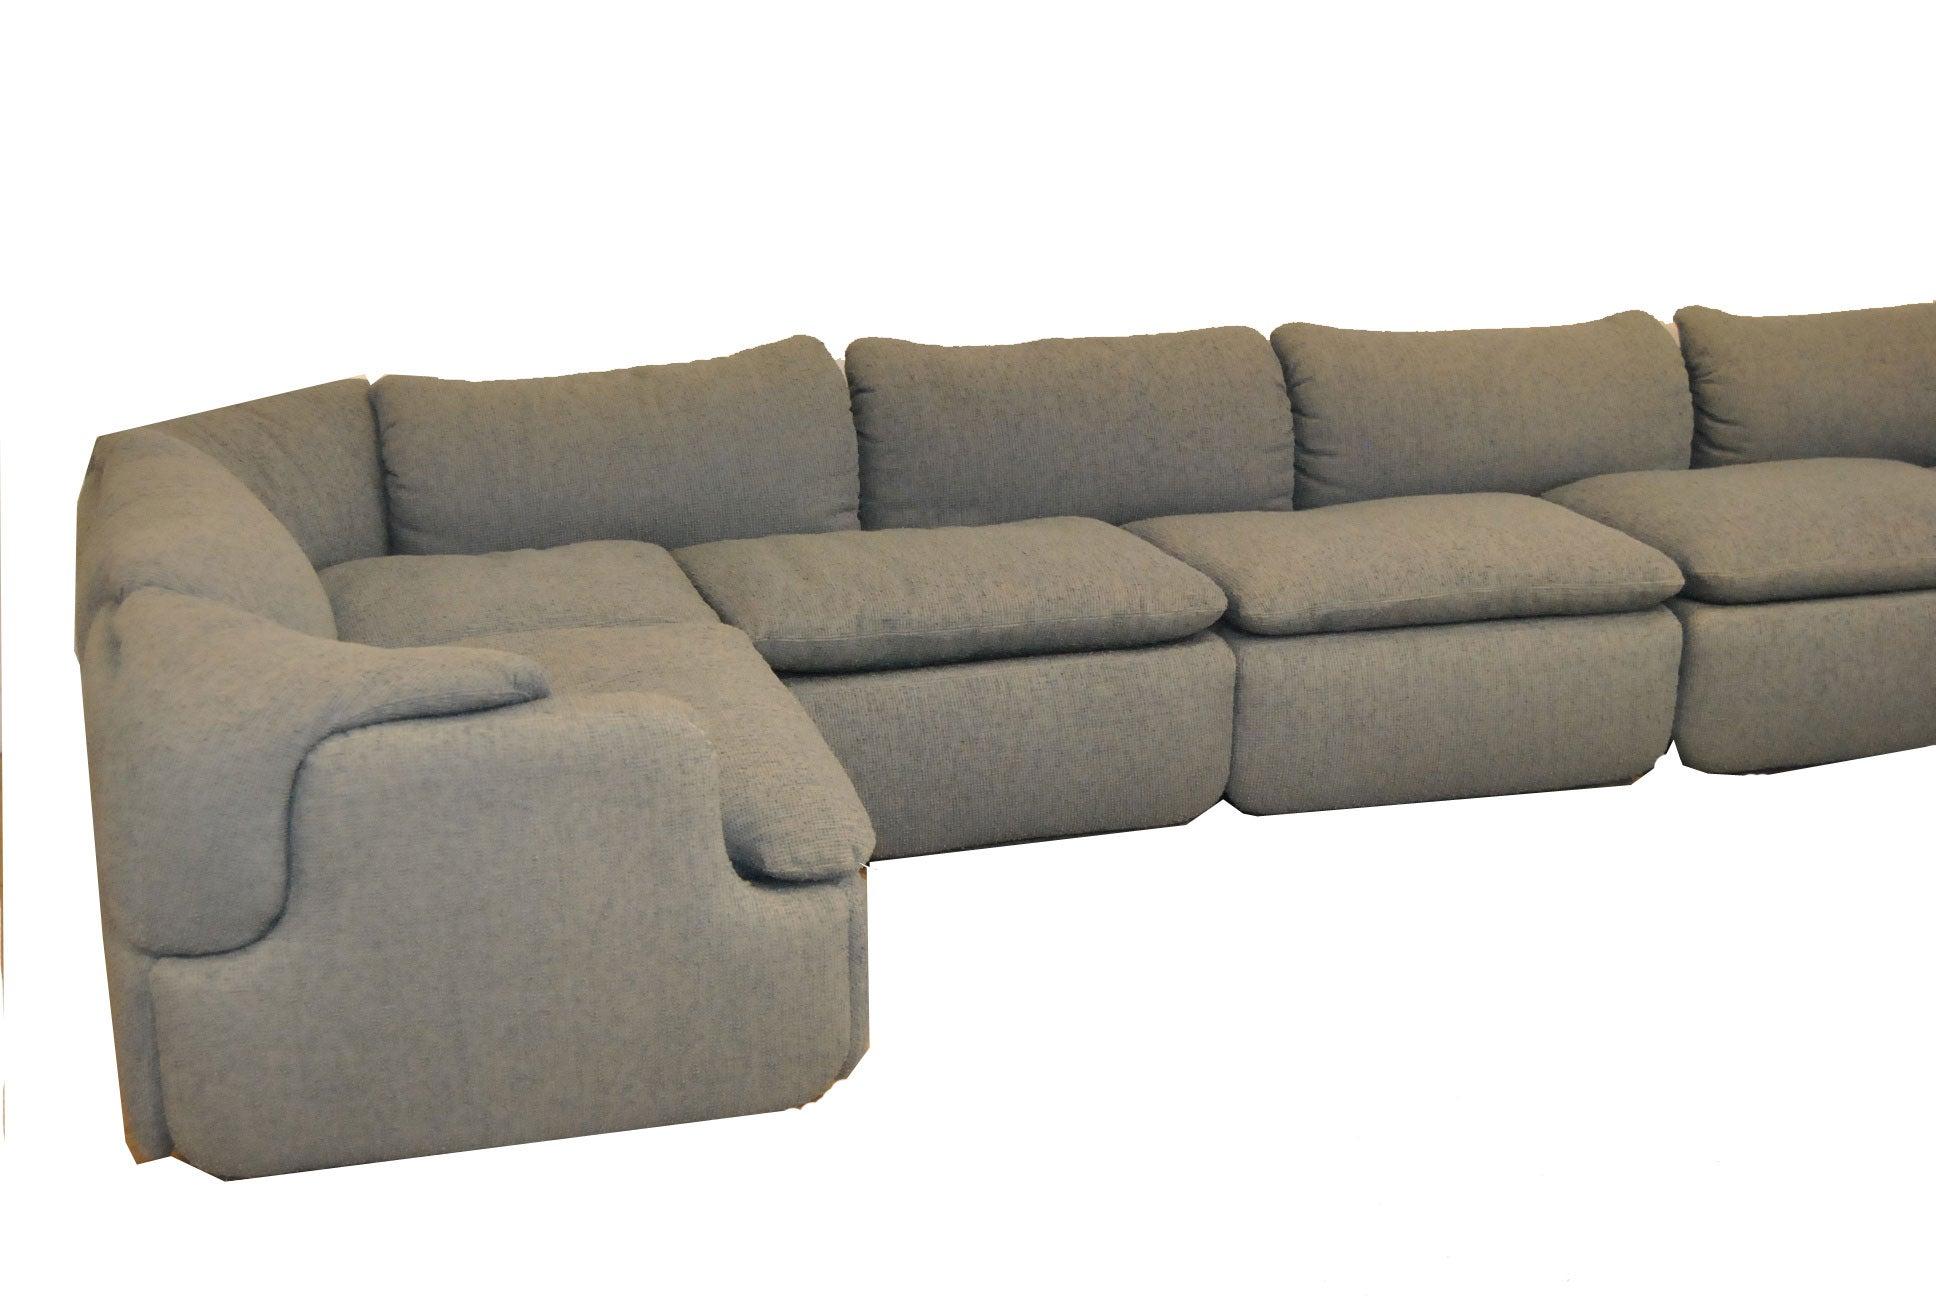 Confidential Sectional Sofa By Alberto Rosselli For Saporiti Italia For